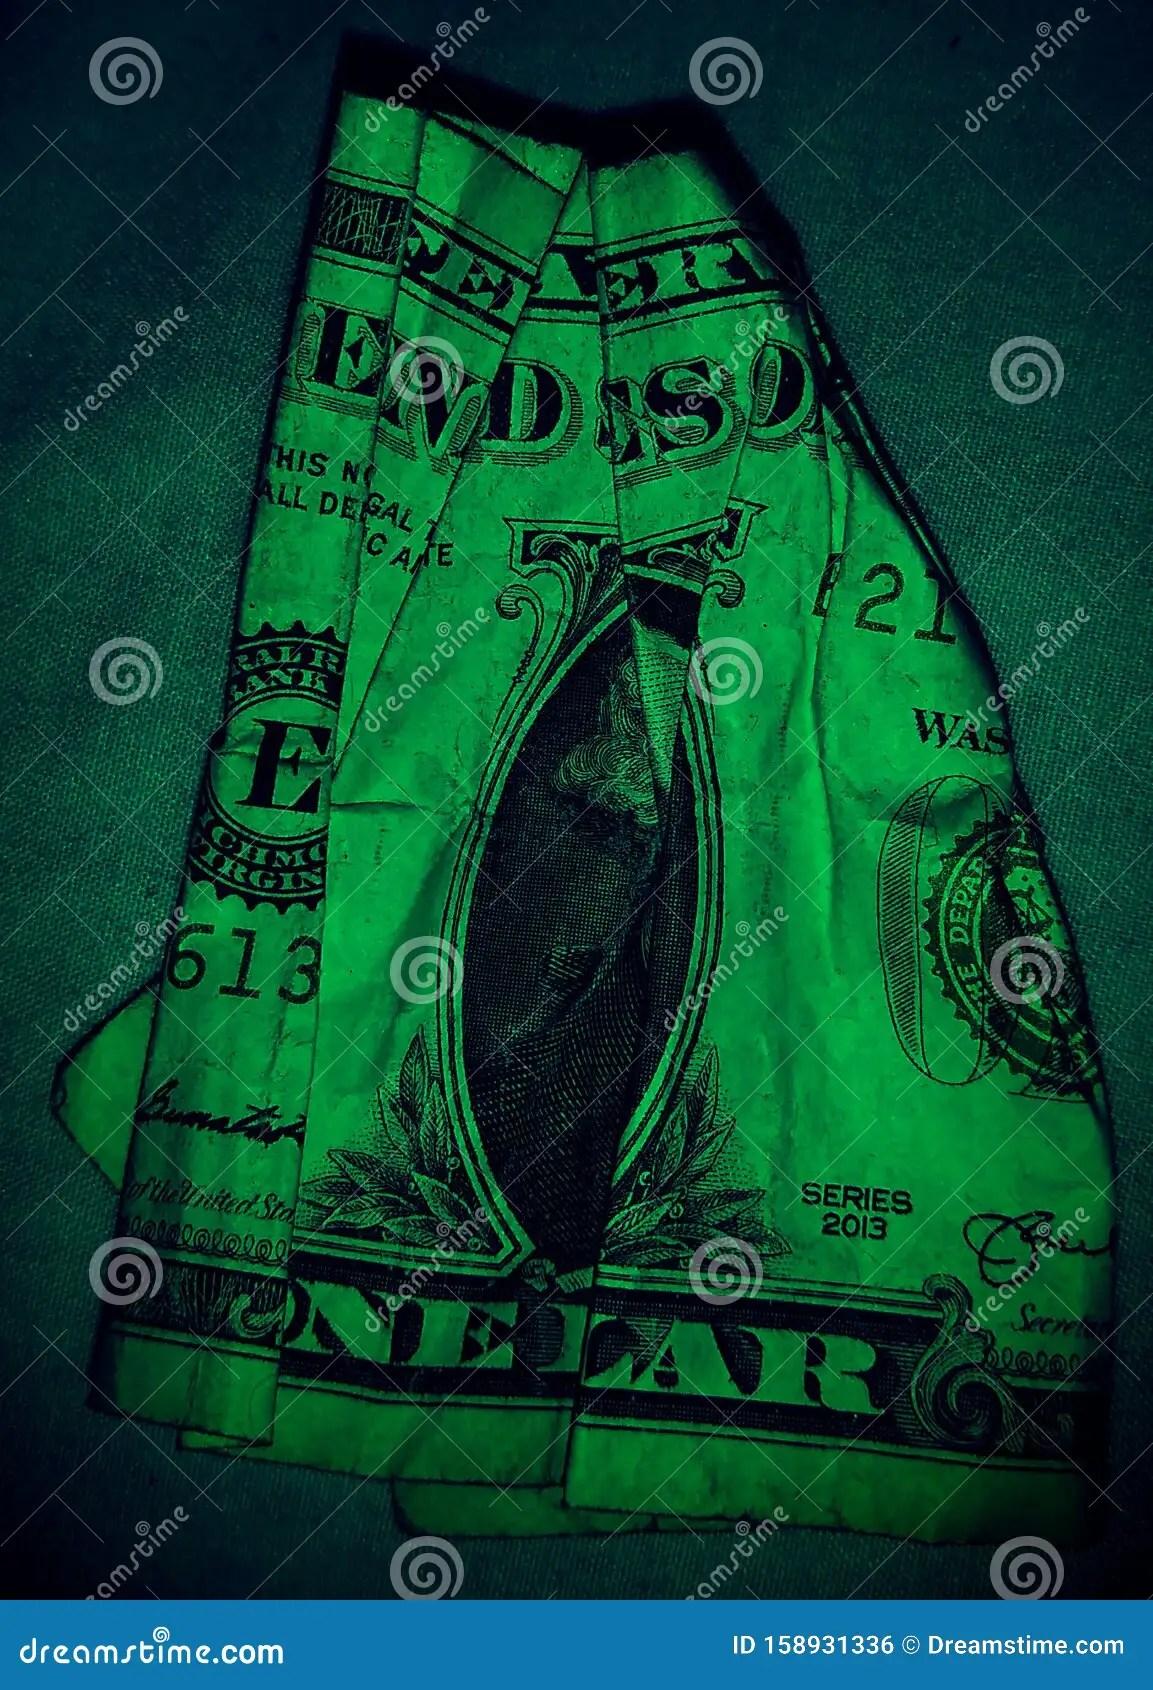 End Is Near Conspiracy Theories Hidden Messages Stock